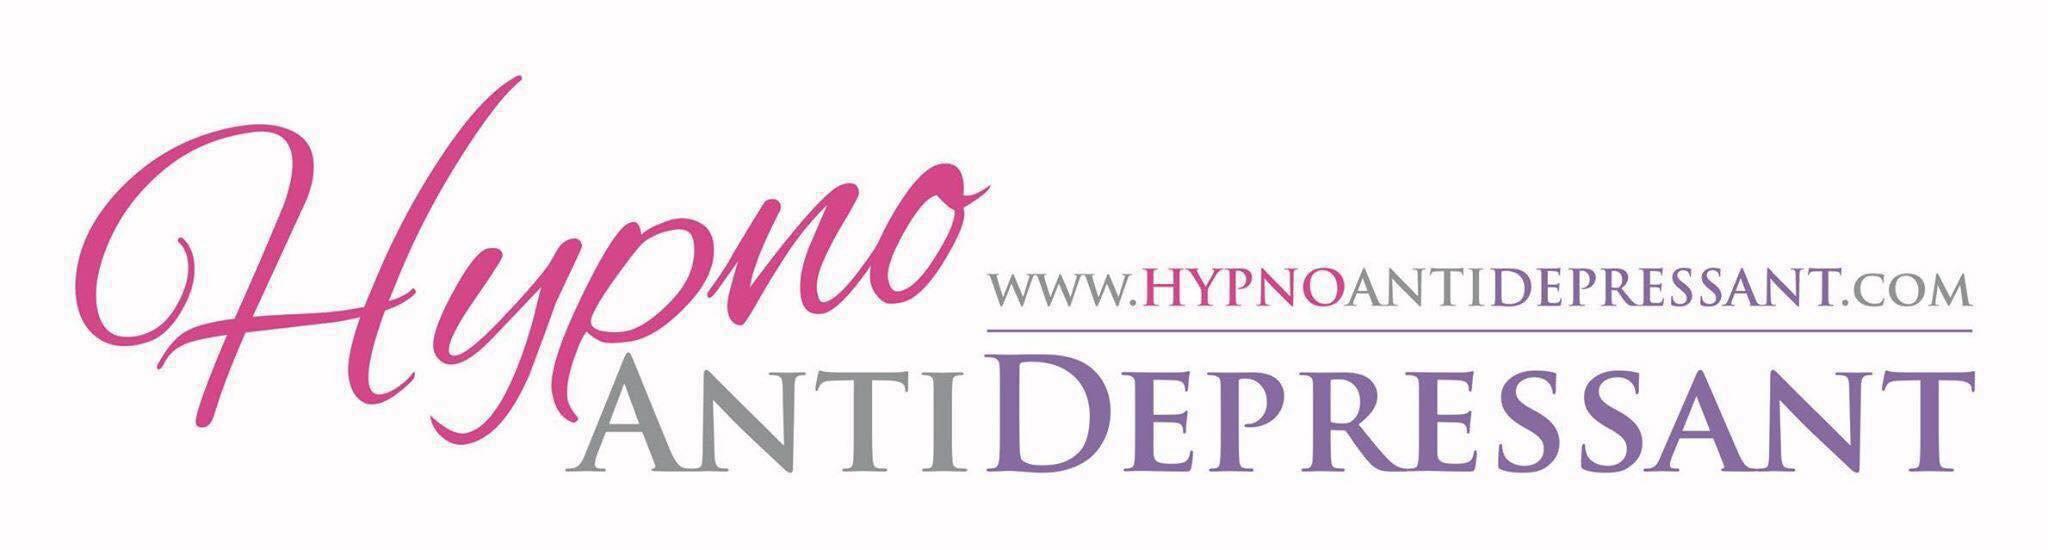 Hypno antidepressant (consultation)